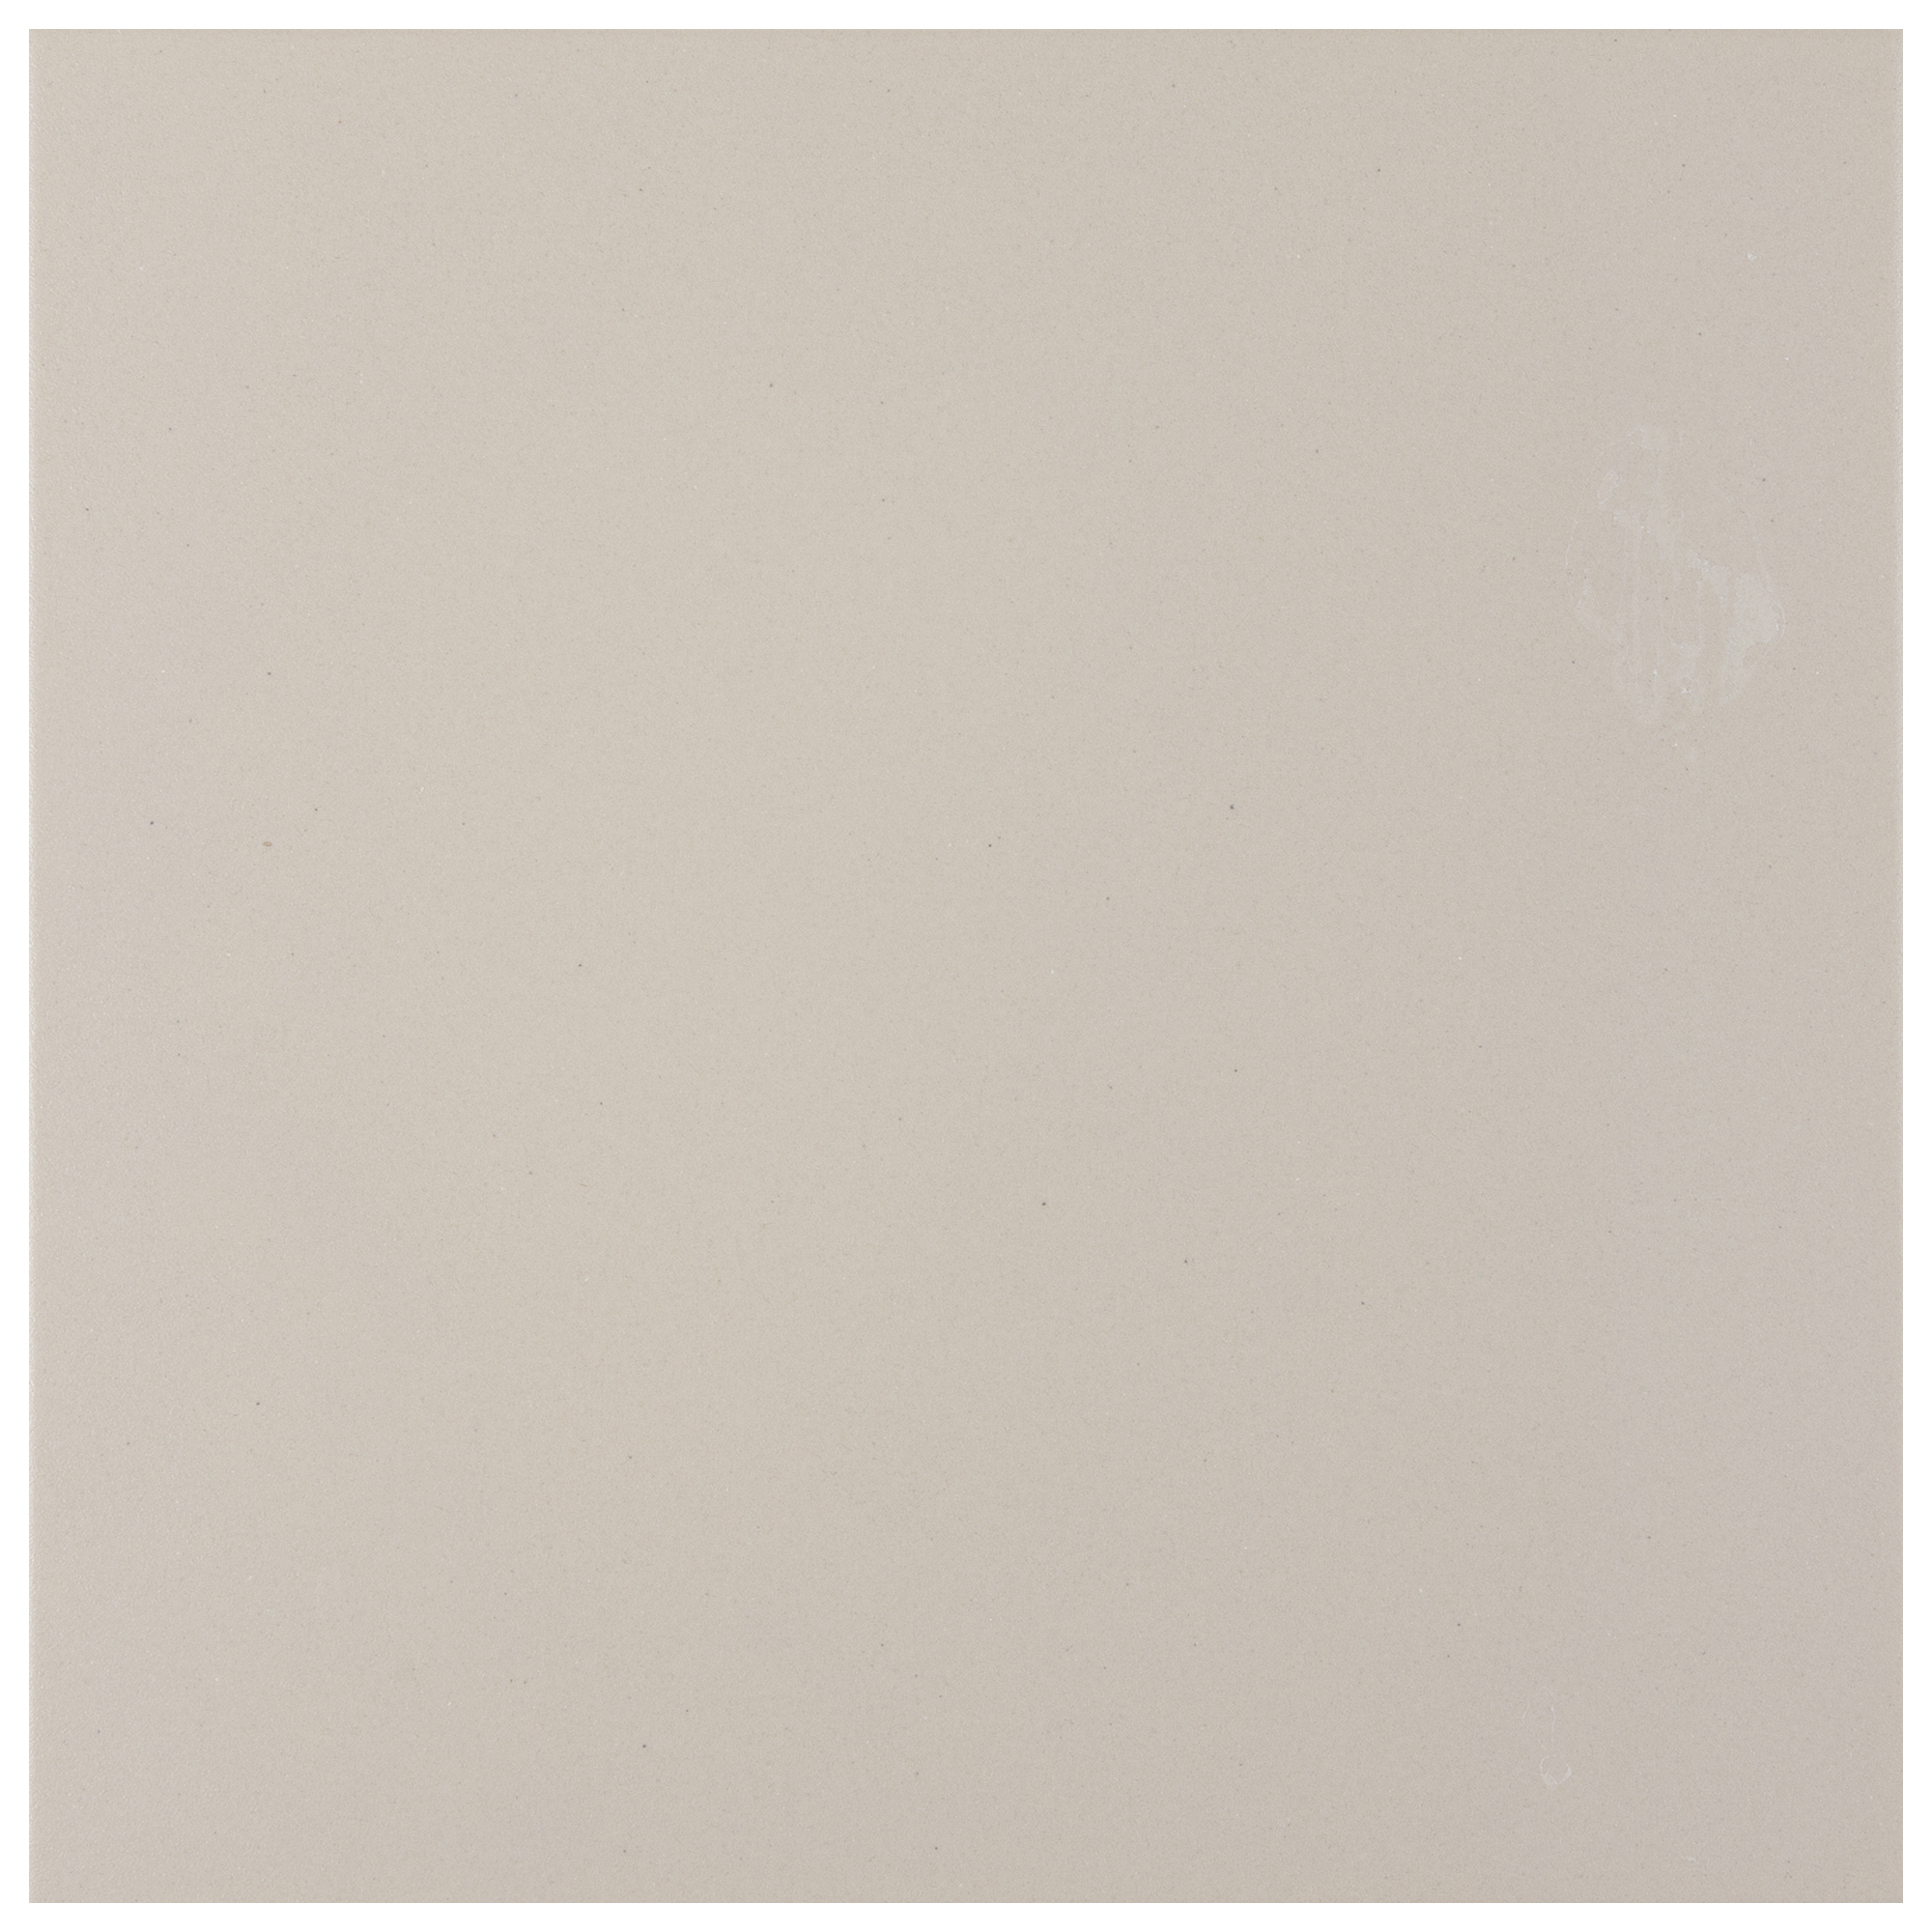 Керамогранит «Техногрес» КС-5 02 30х30 см 1.35 м2 цвет бежевый